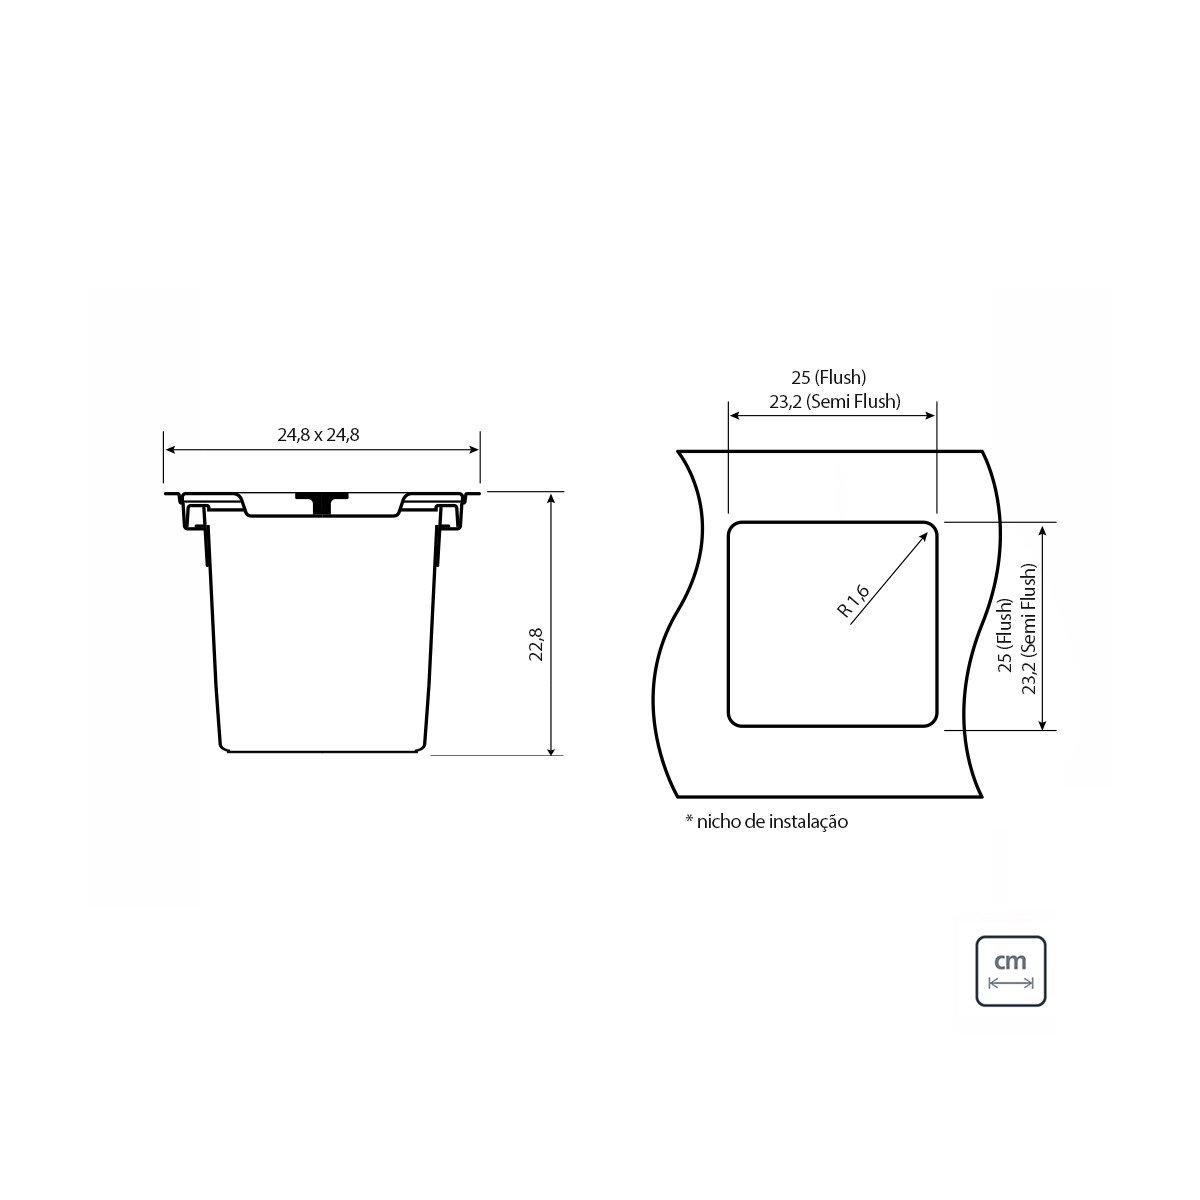 Lixeira Quadrada Tramontina 5 litros Clean Square de Embutir